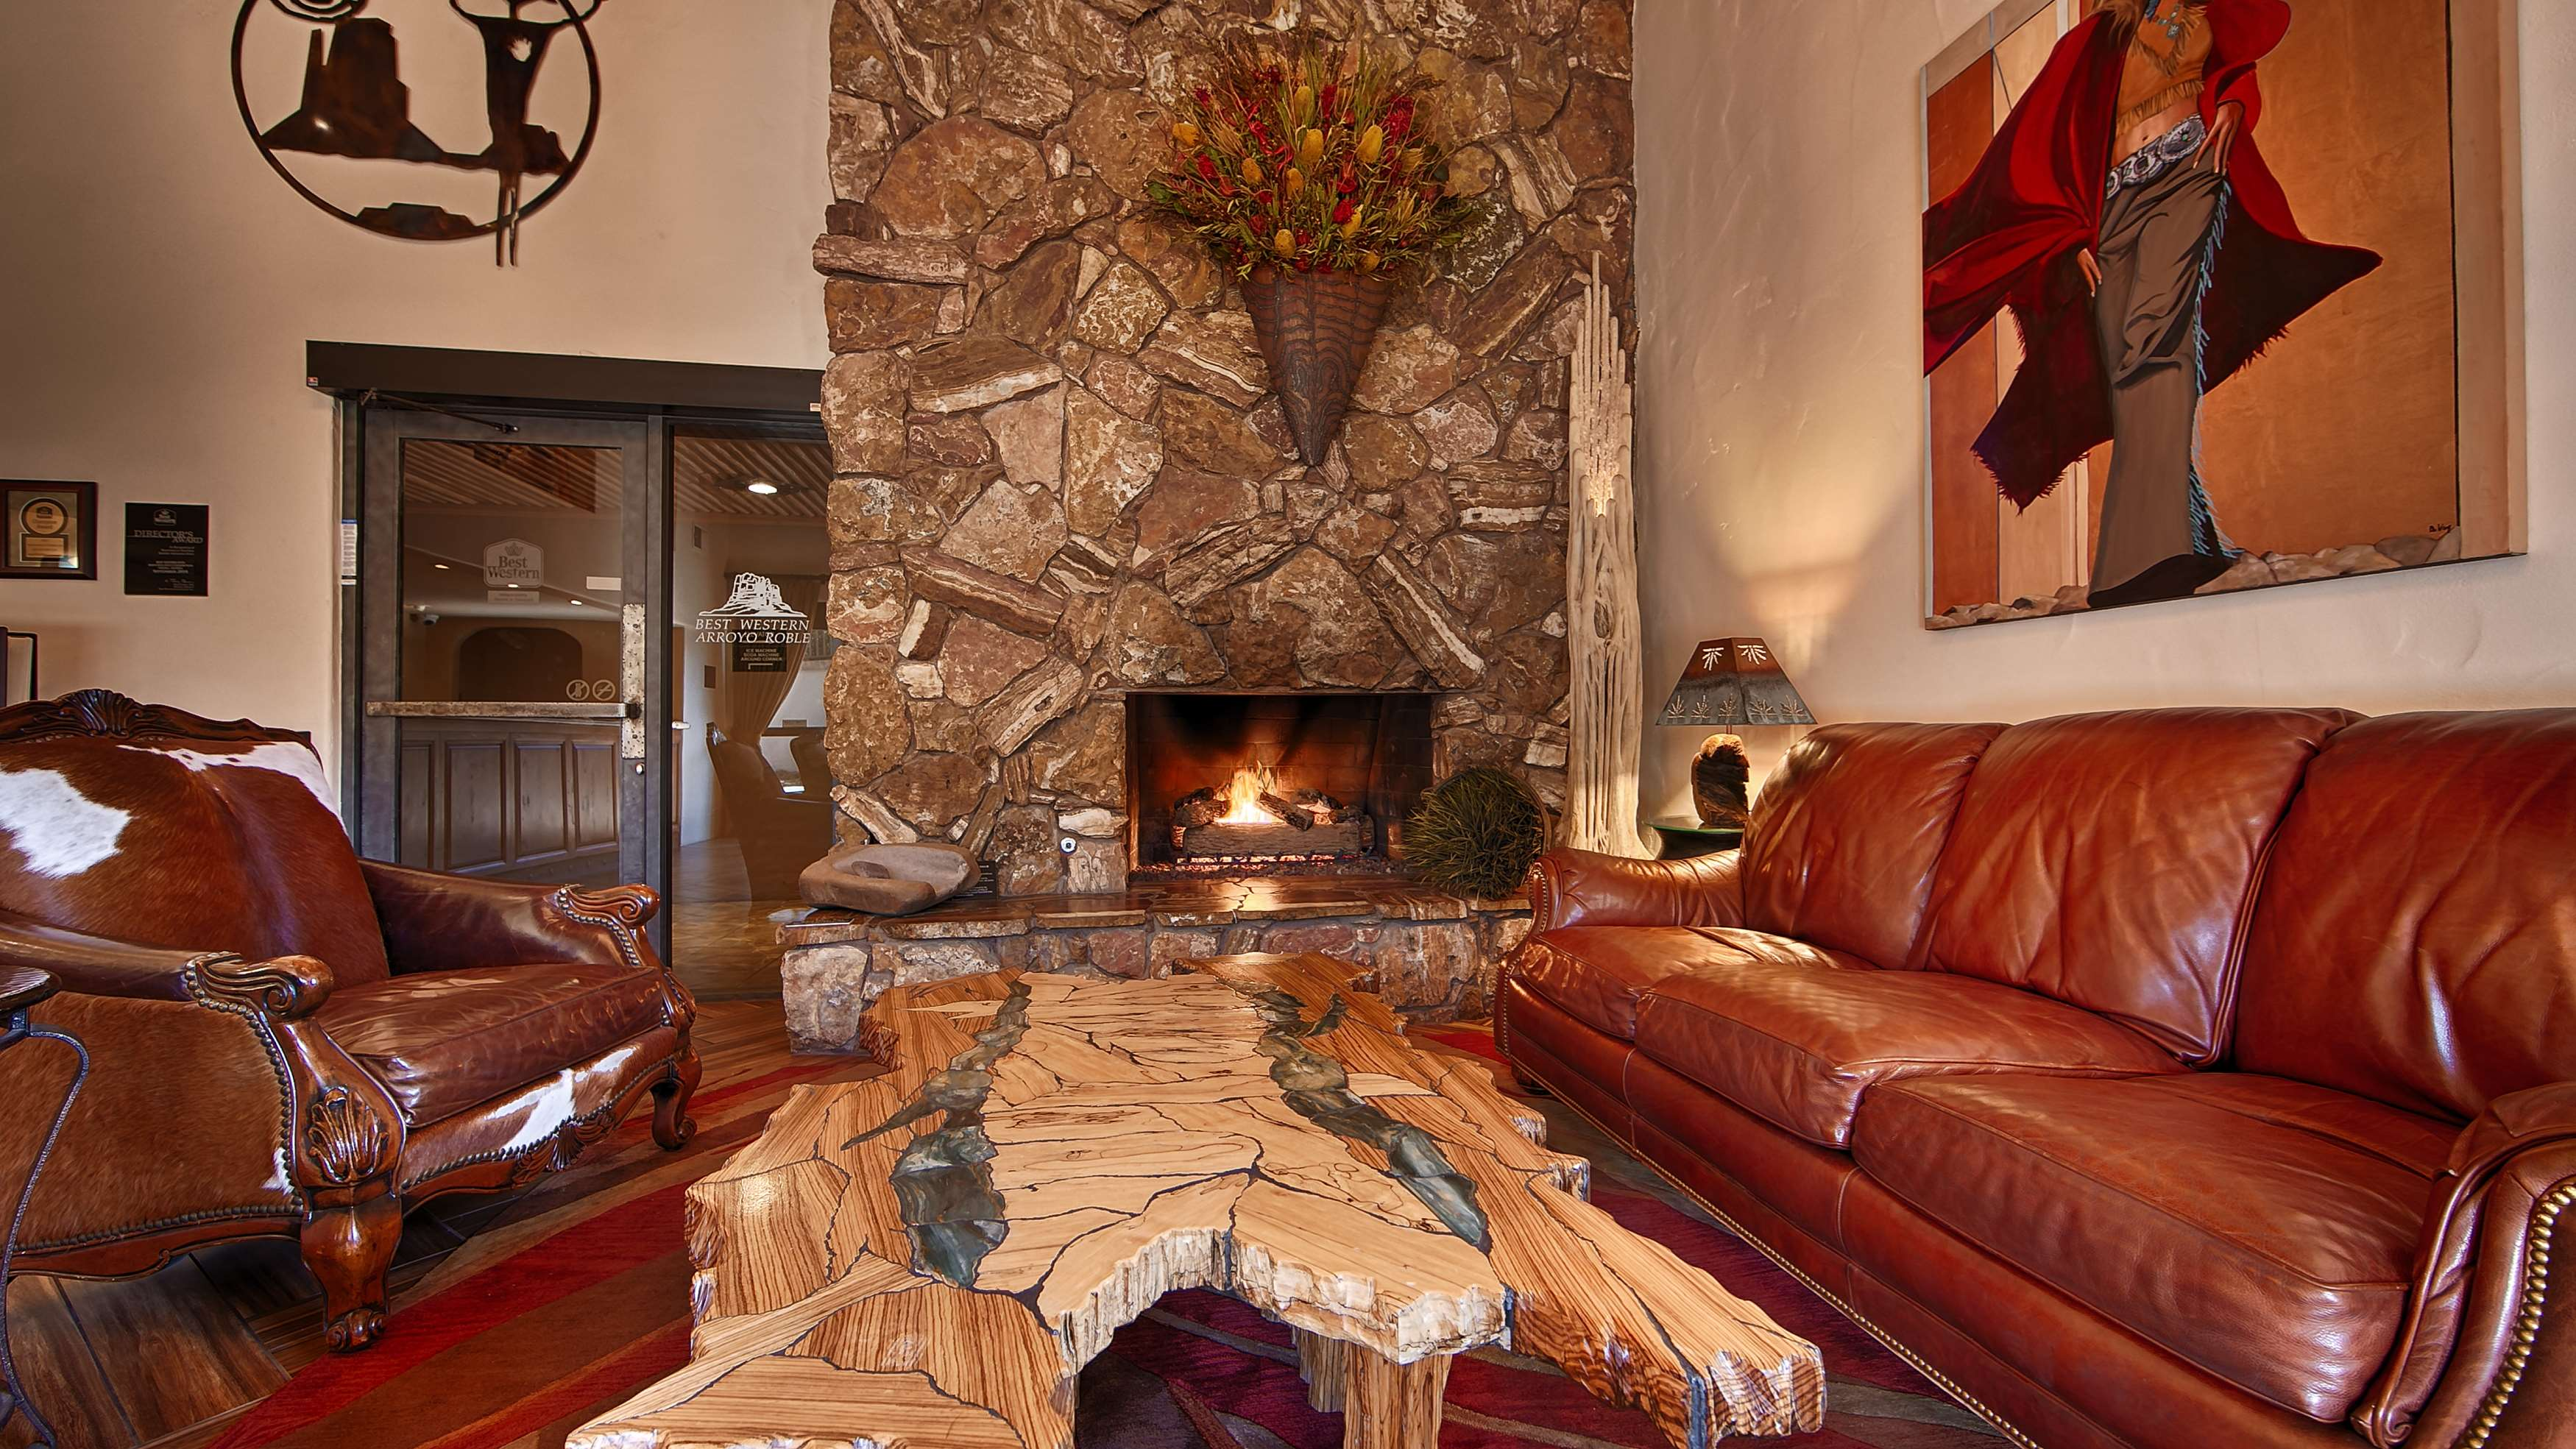 Best Western Plus Arroyo Roble Hotel & Creekside Villas image 6